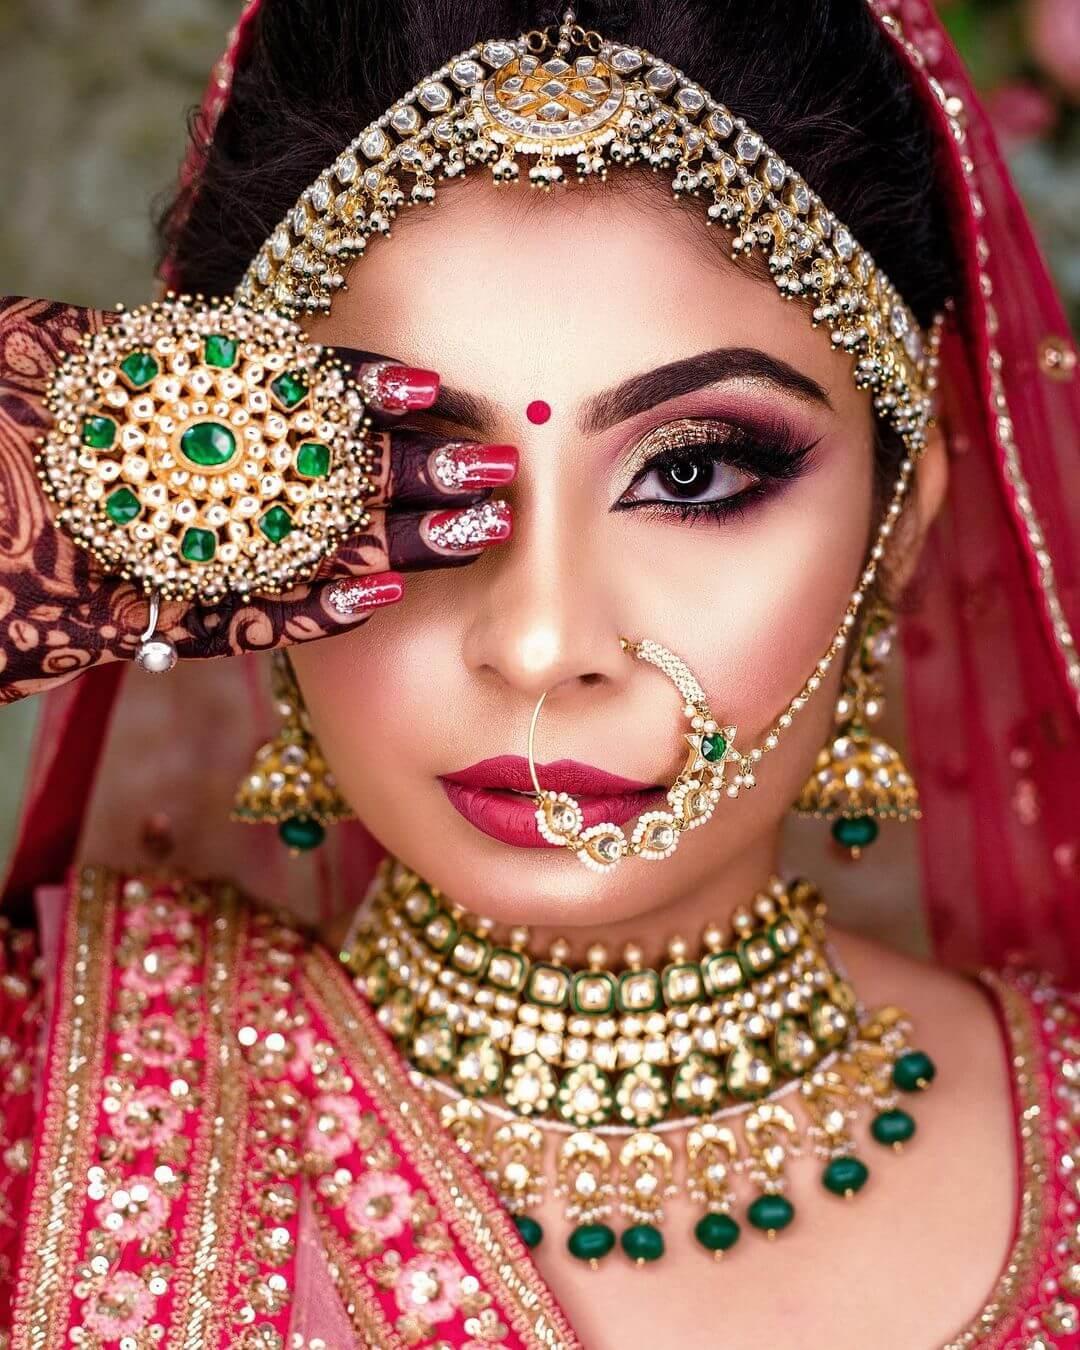 The Golden bridal look